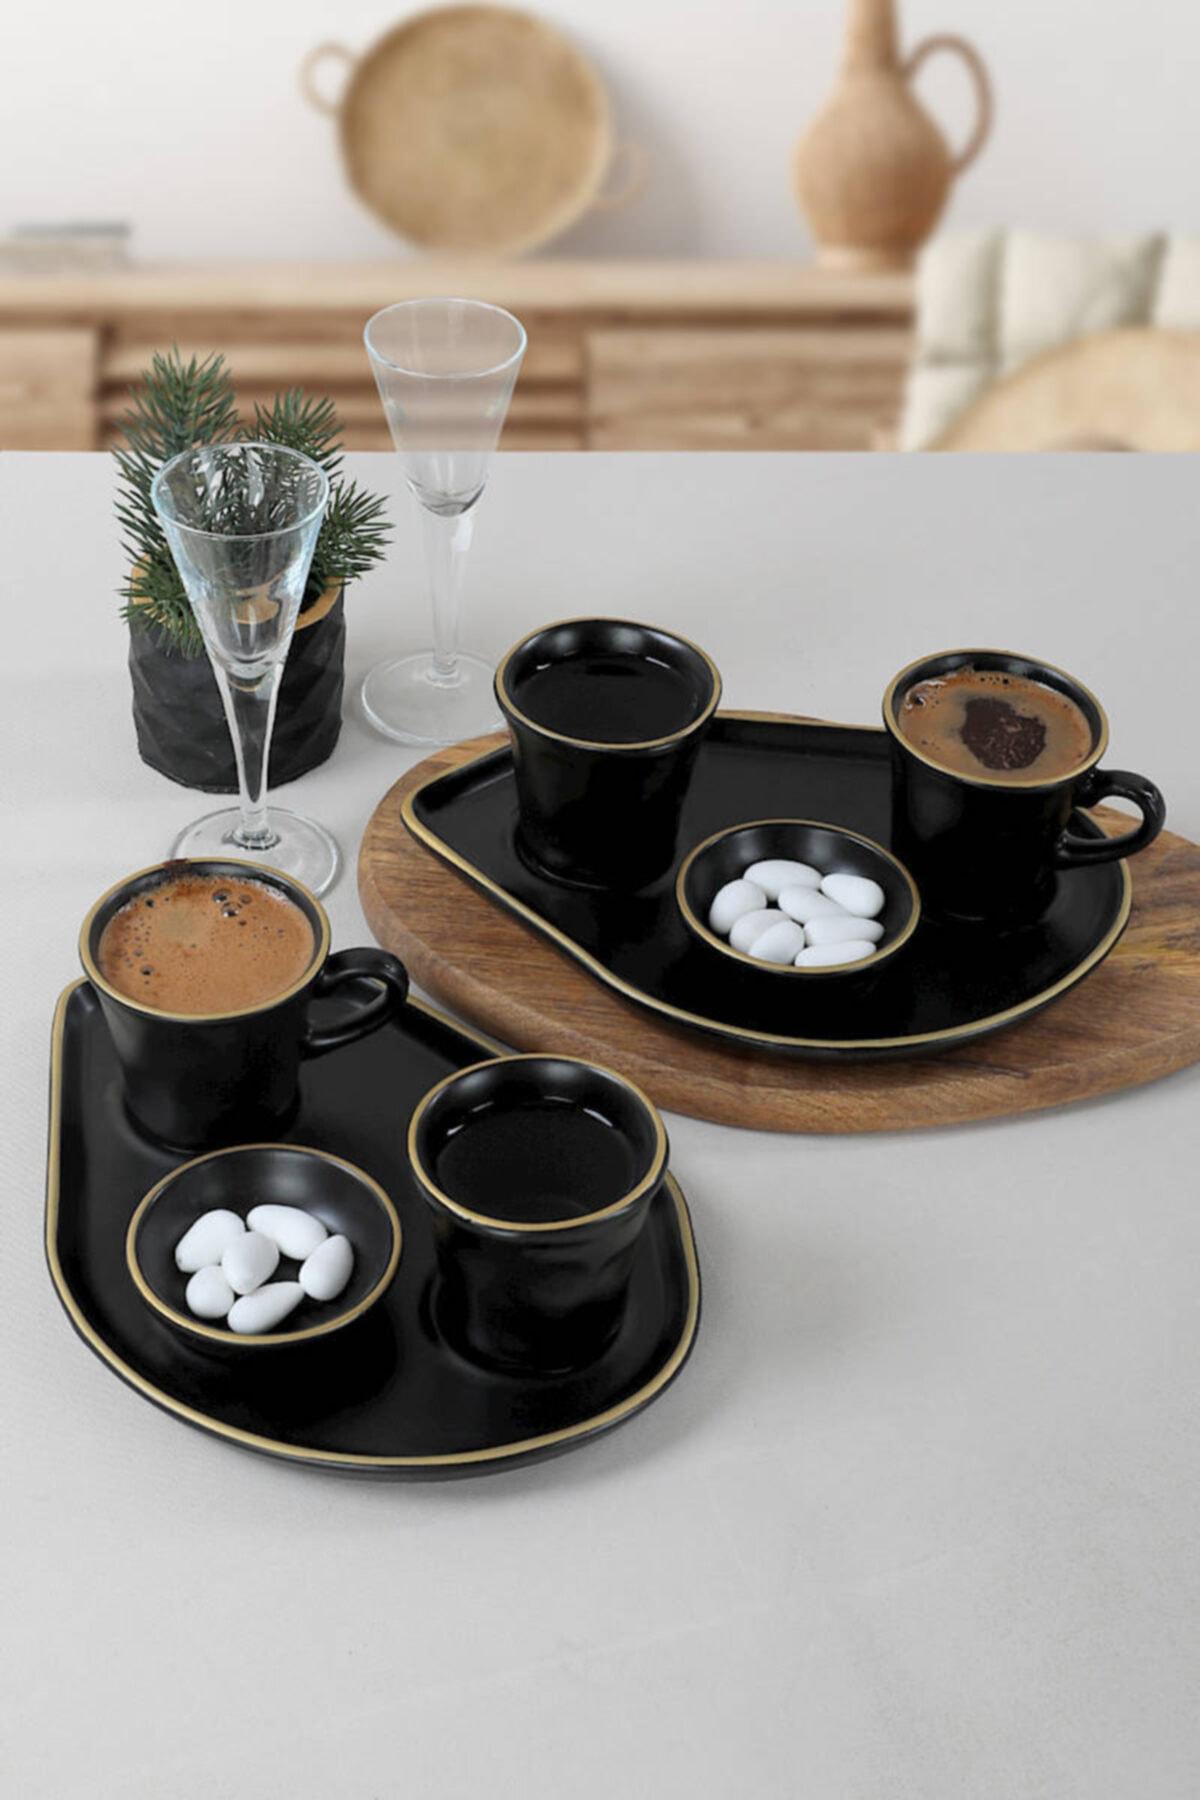 Karamika- 2 شخصية 8 قطعة القهوة التركية-اسبريسو التموين-مجموعة التقديم.